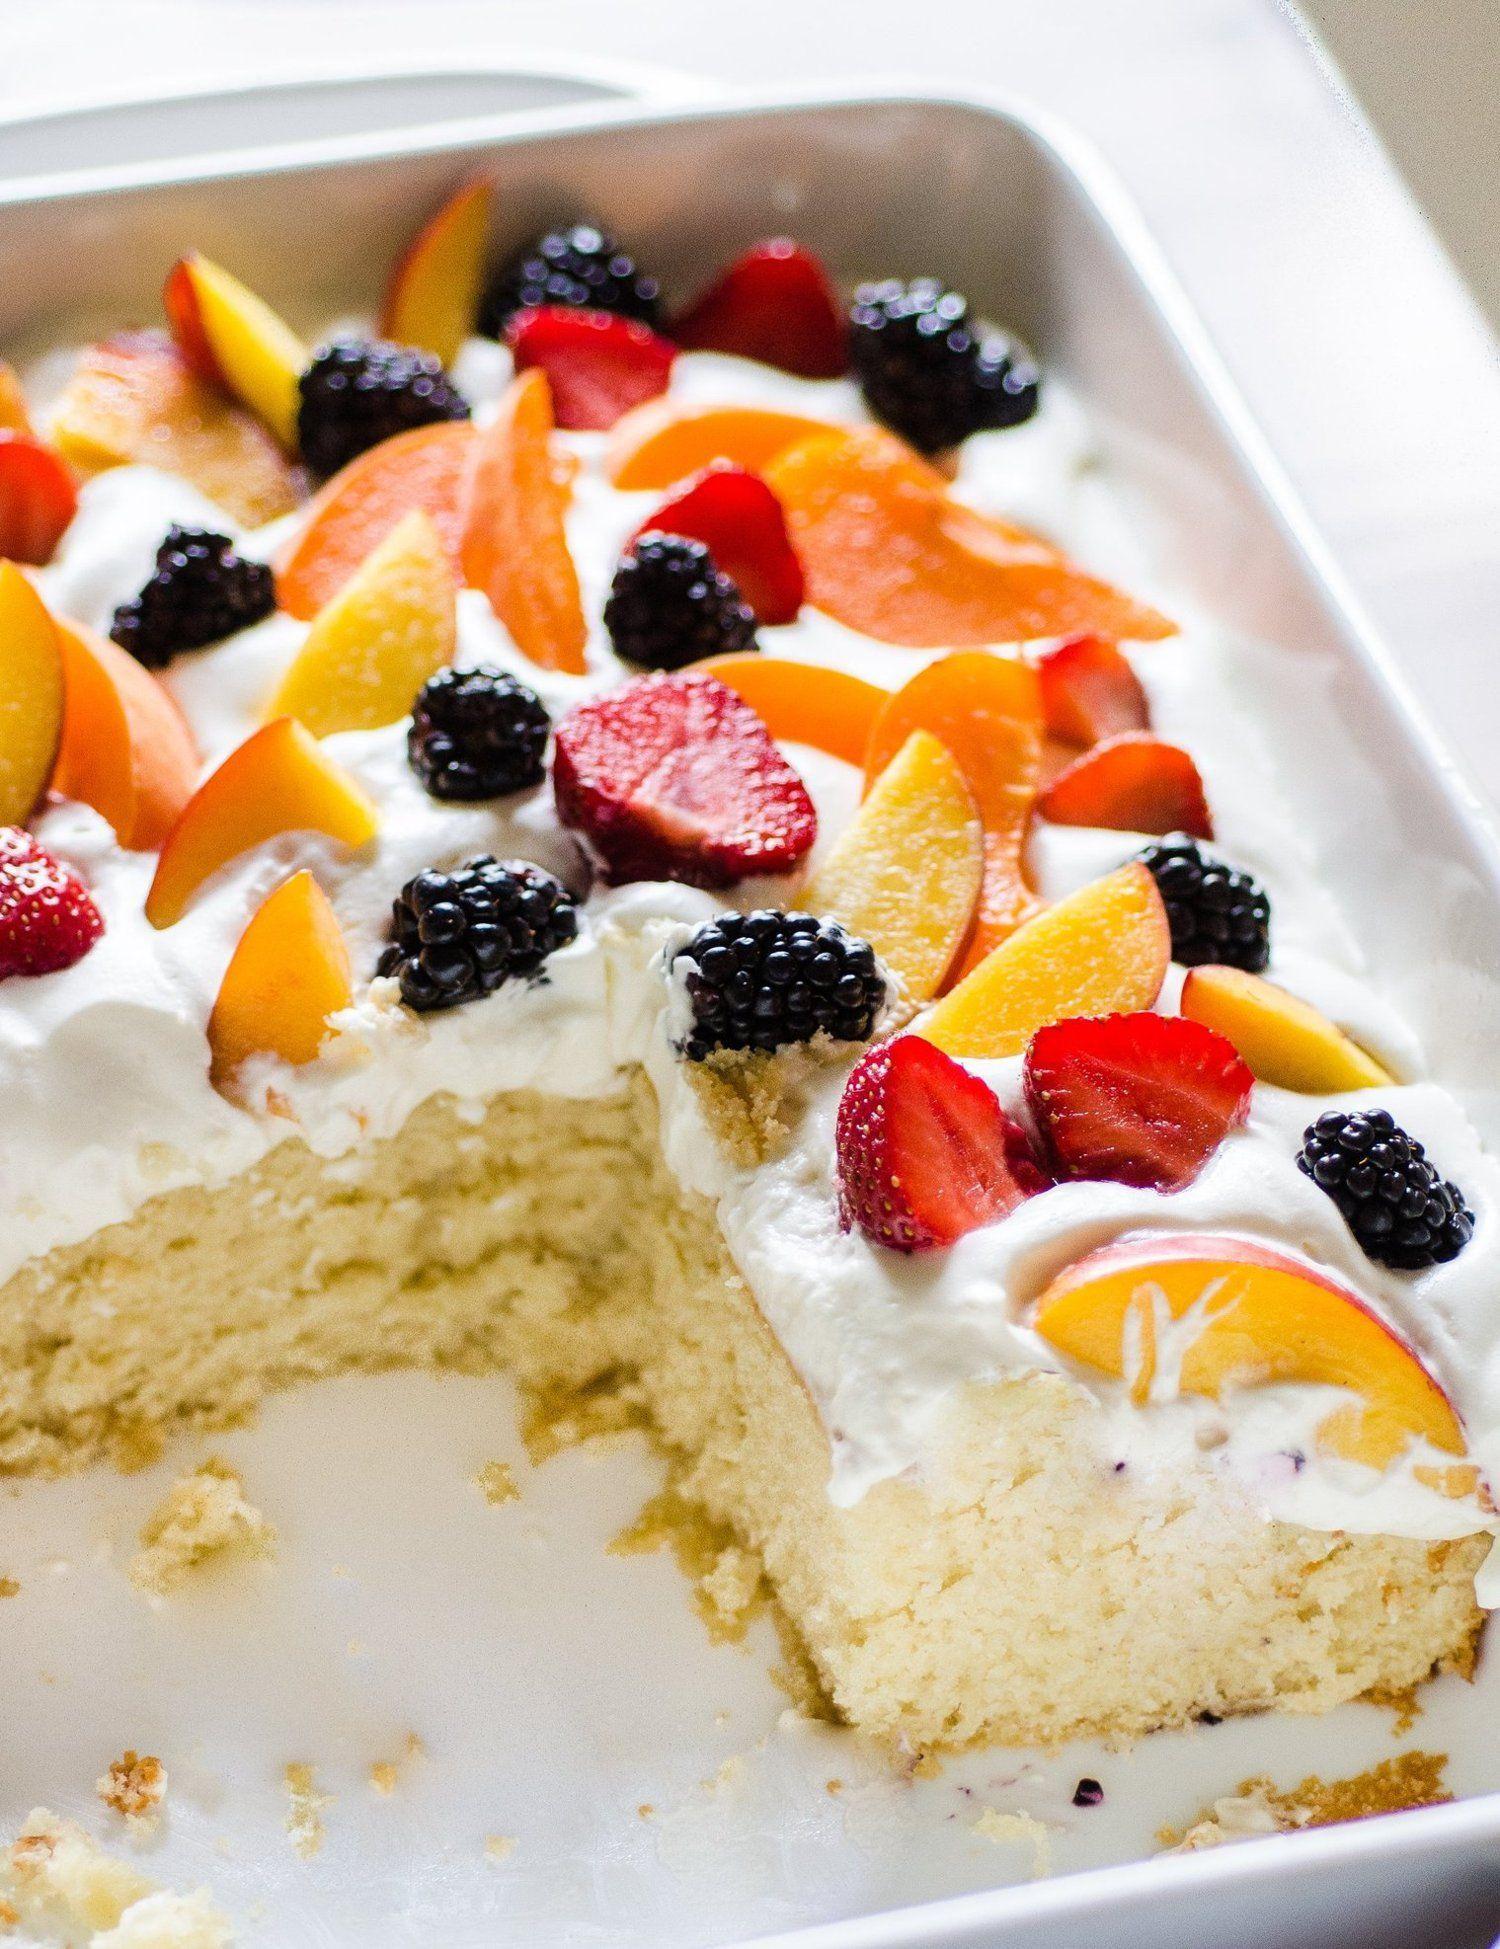 Summer Easy Desserts  Recipe Easy Summer Cake with Fruit & Cream — Dessert